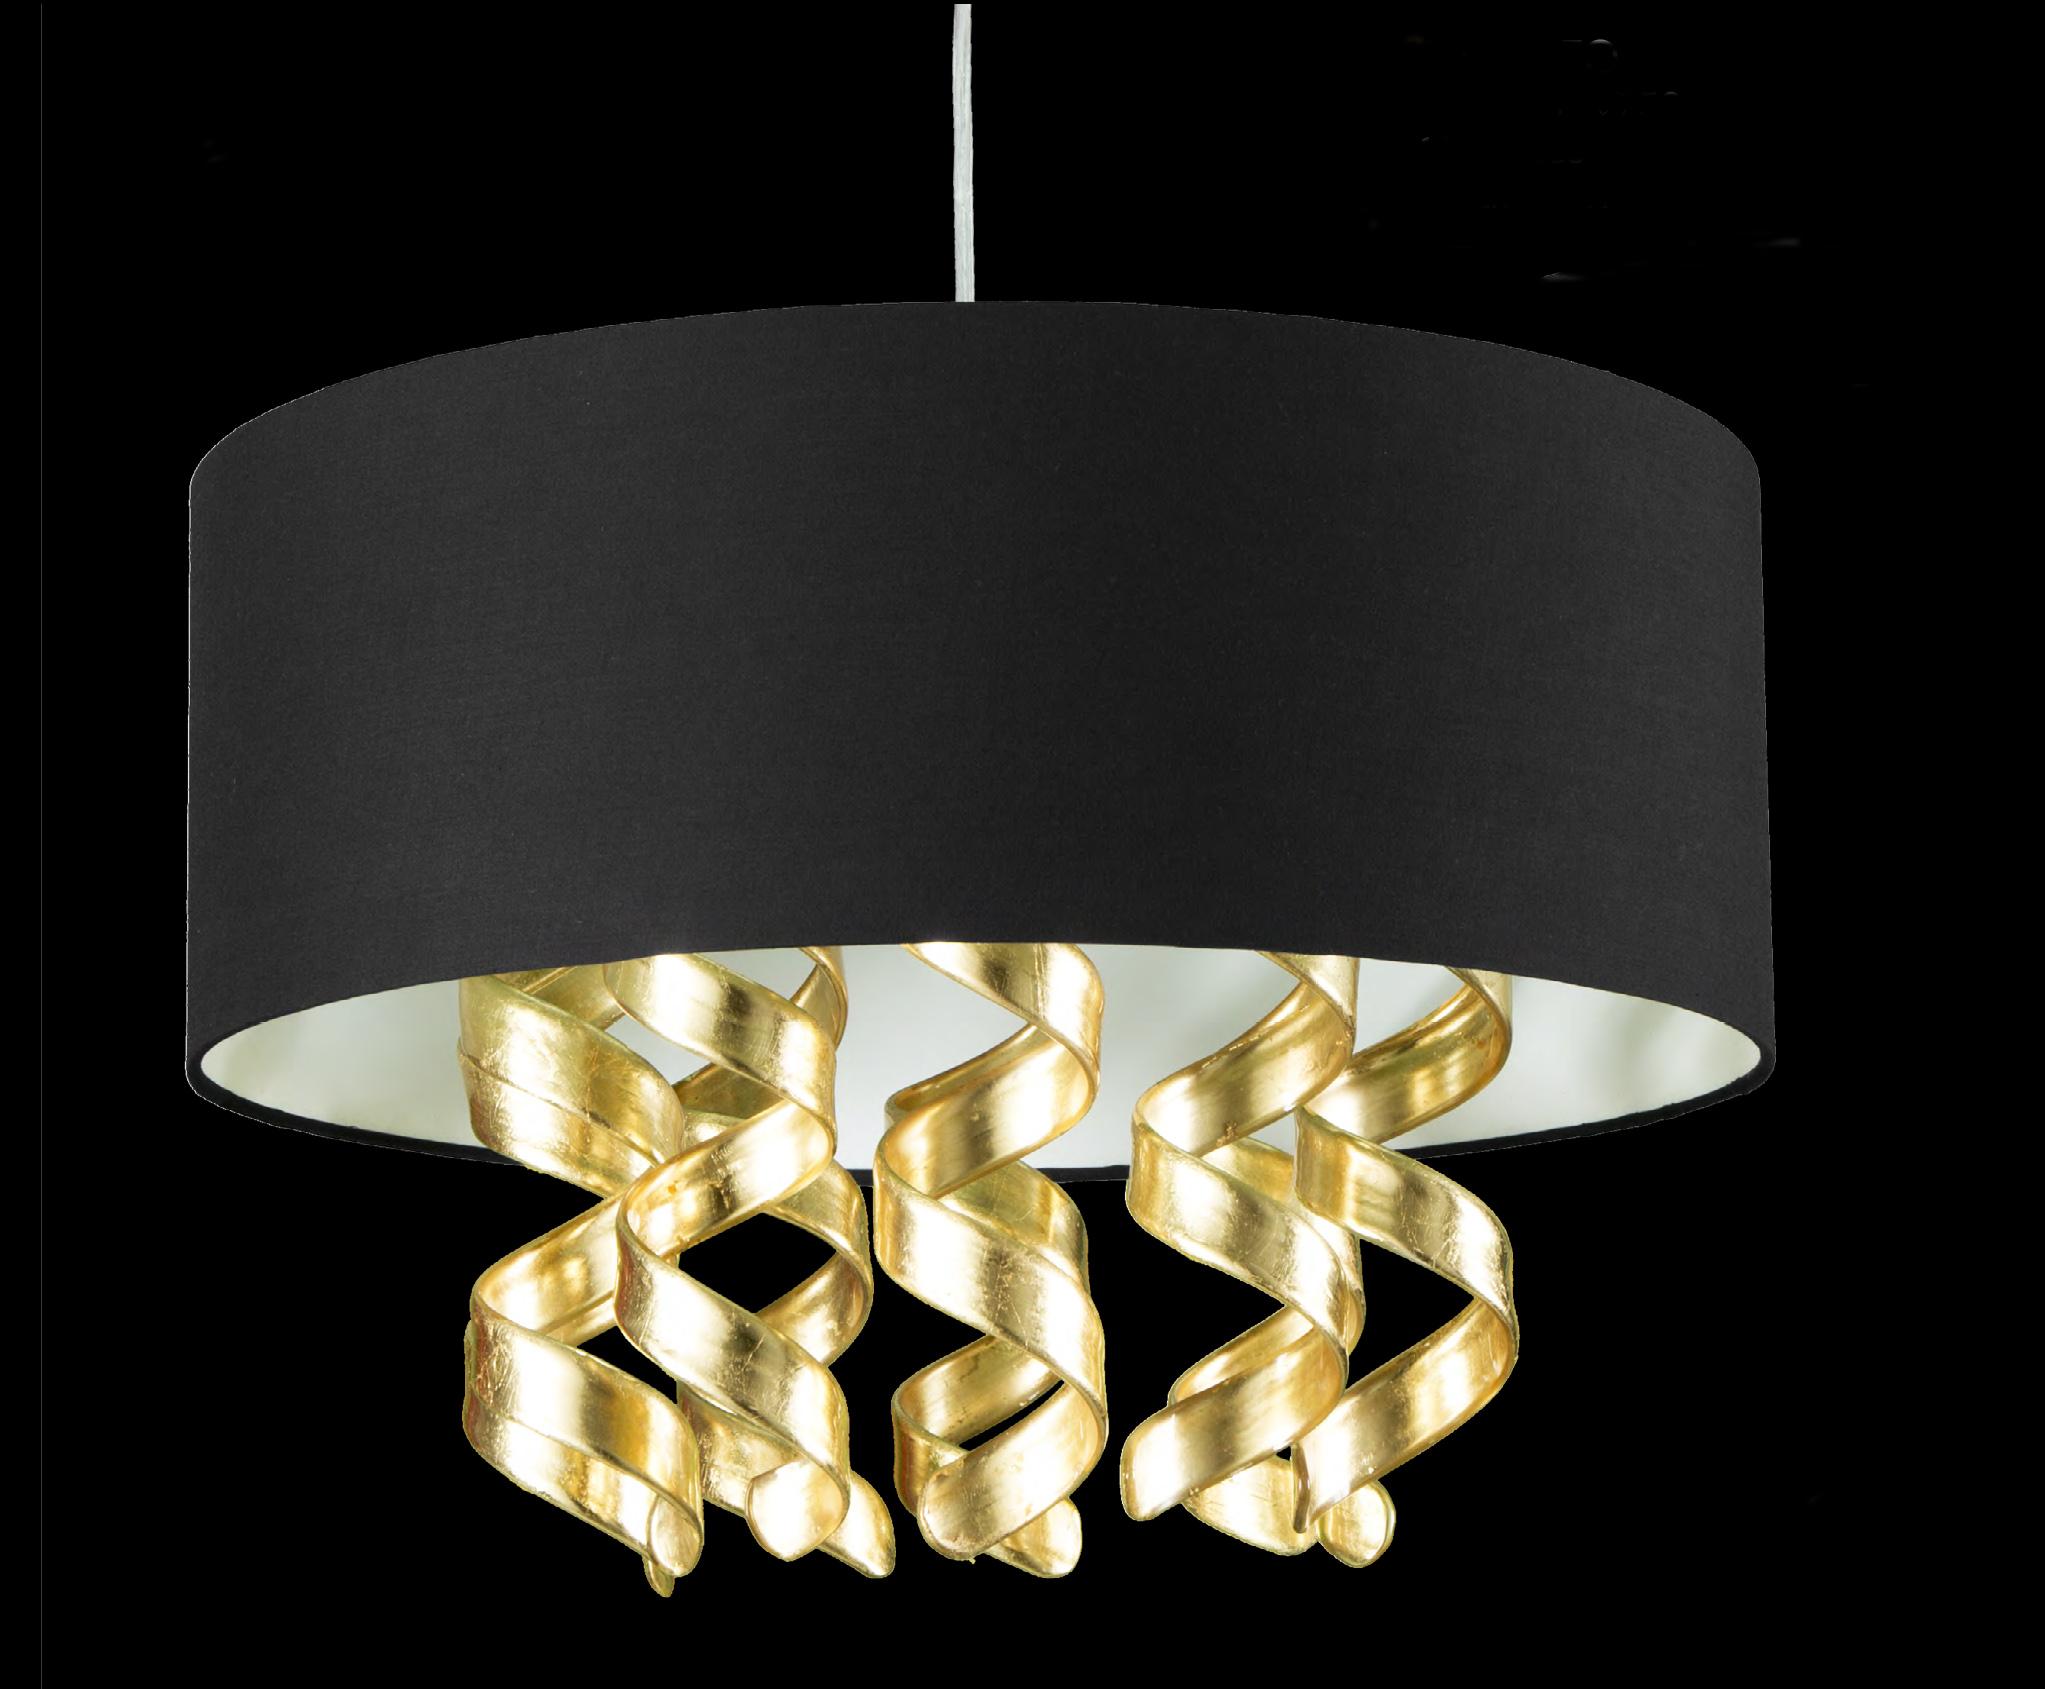 albani lampadari : Lampadari Lampada a sospensione SHARON 1052-FO - Vendita lampadari ...